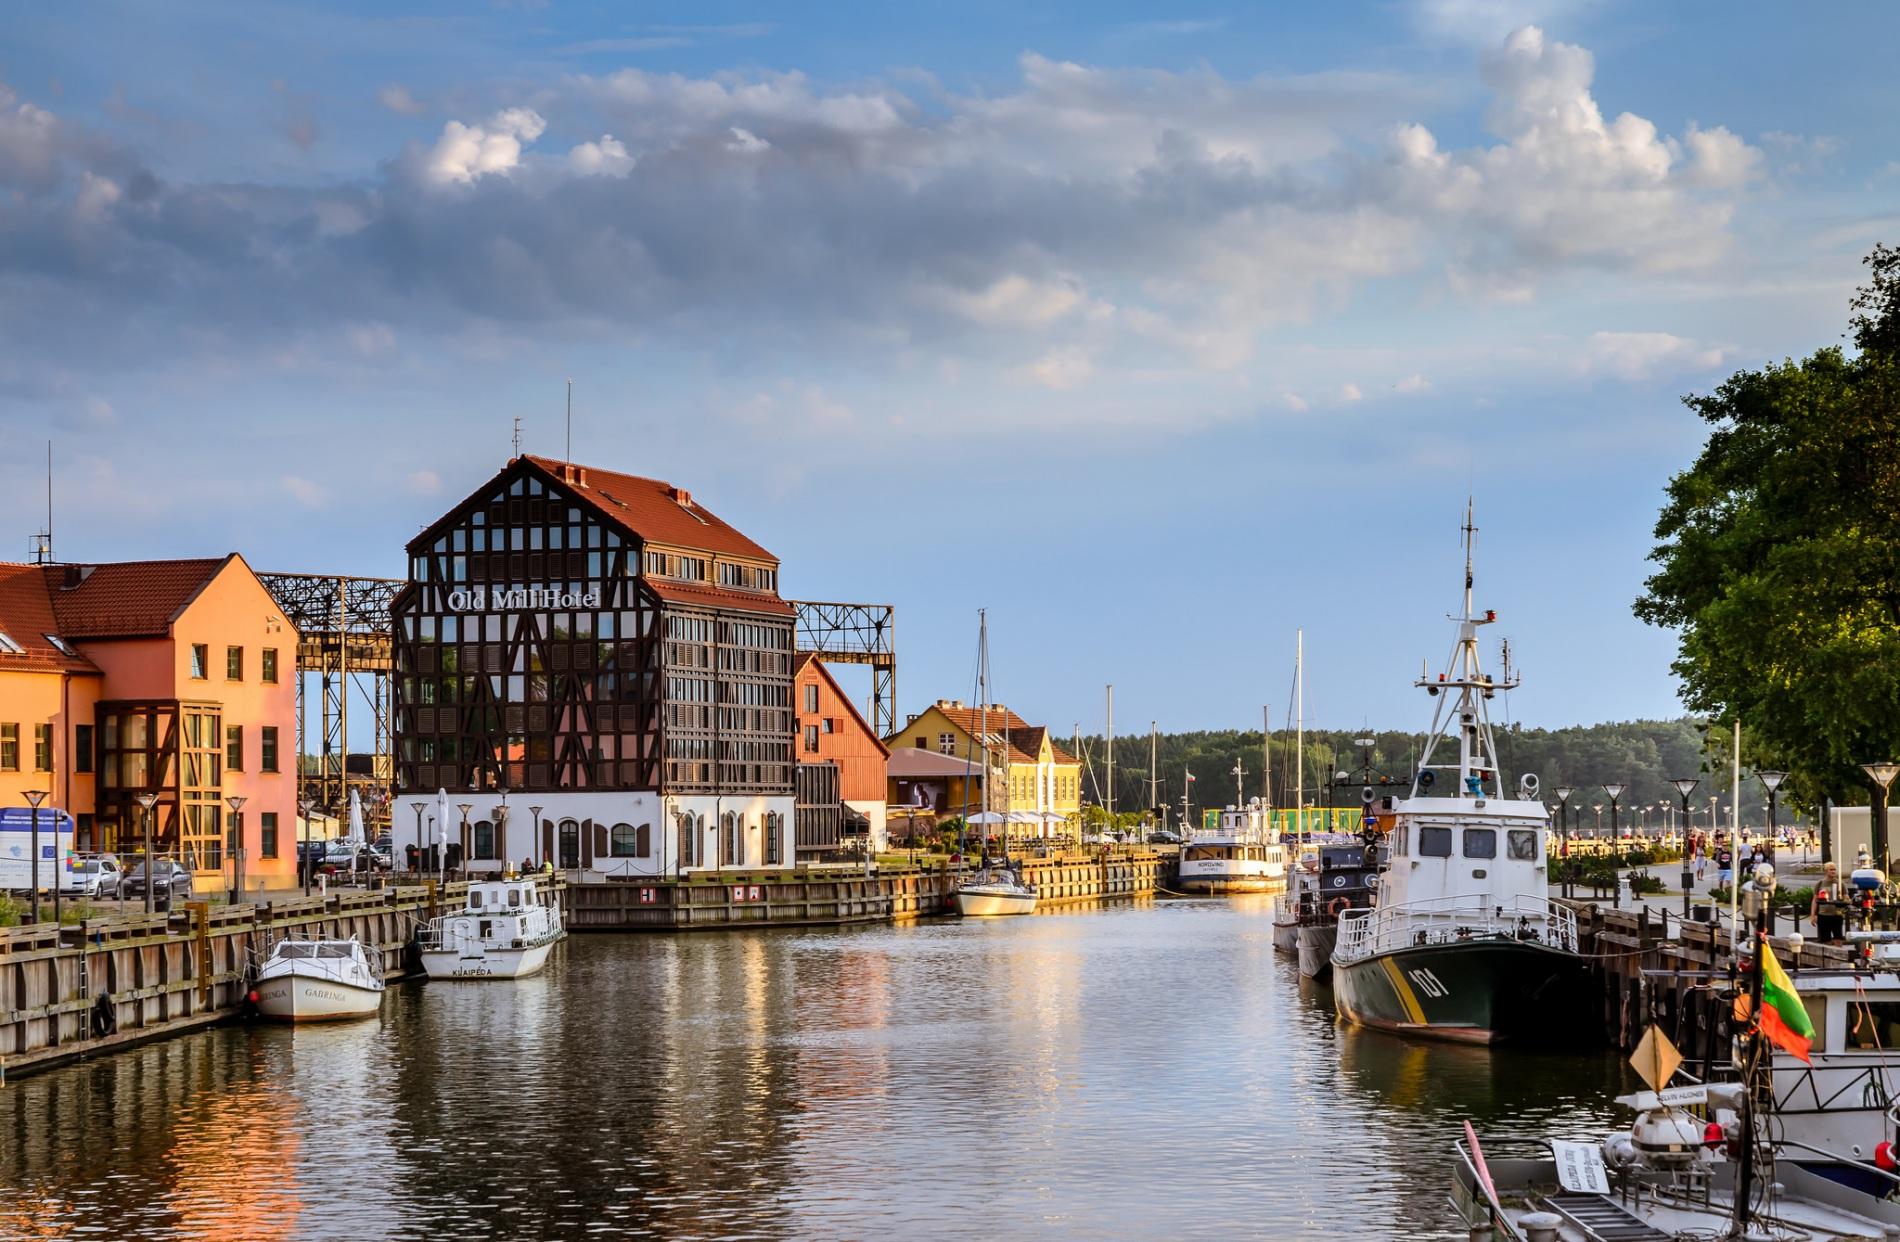 Порт Клайпеды / Фото: flickr.com/112693323N04